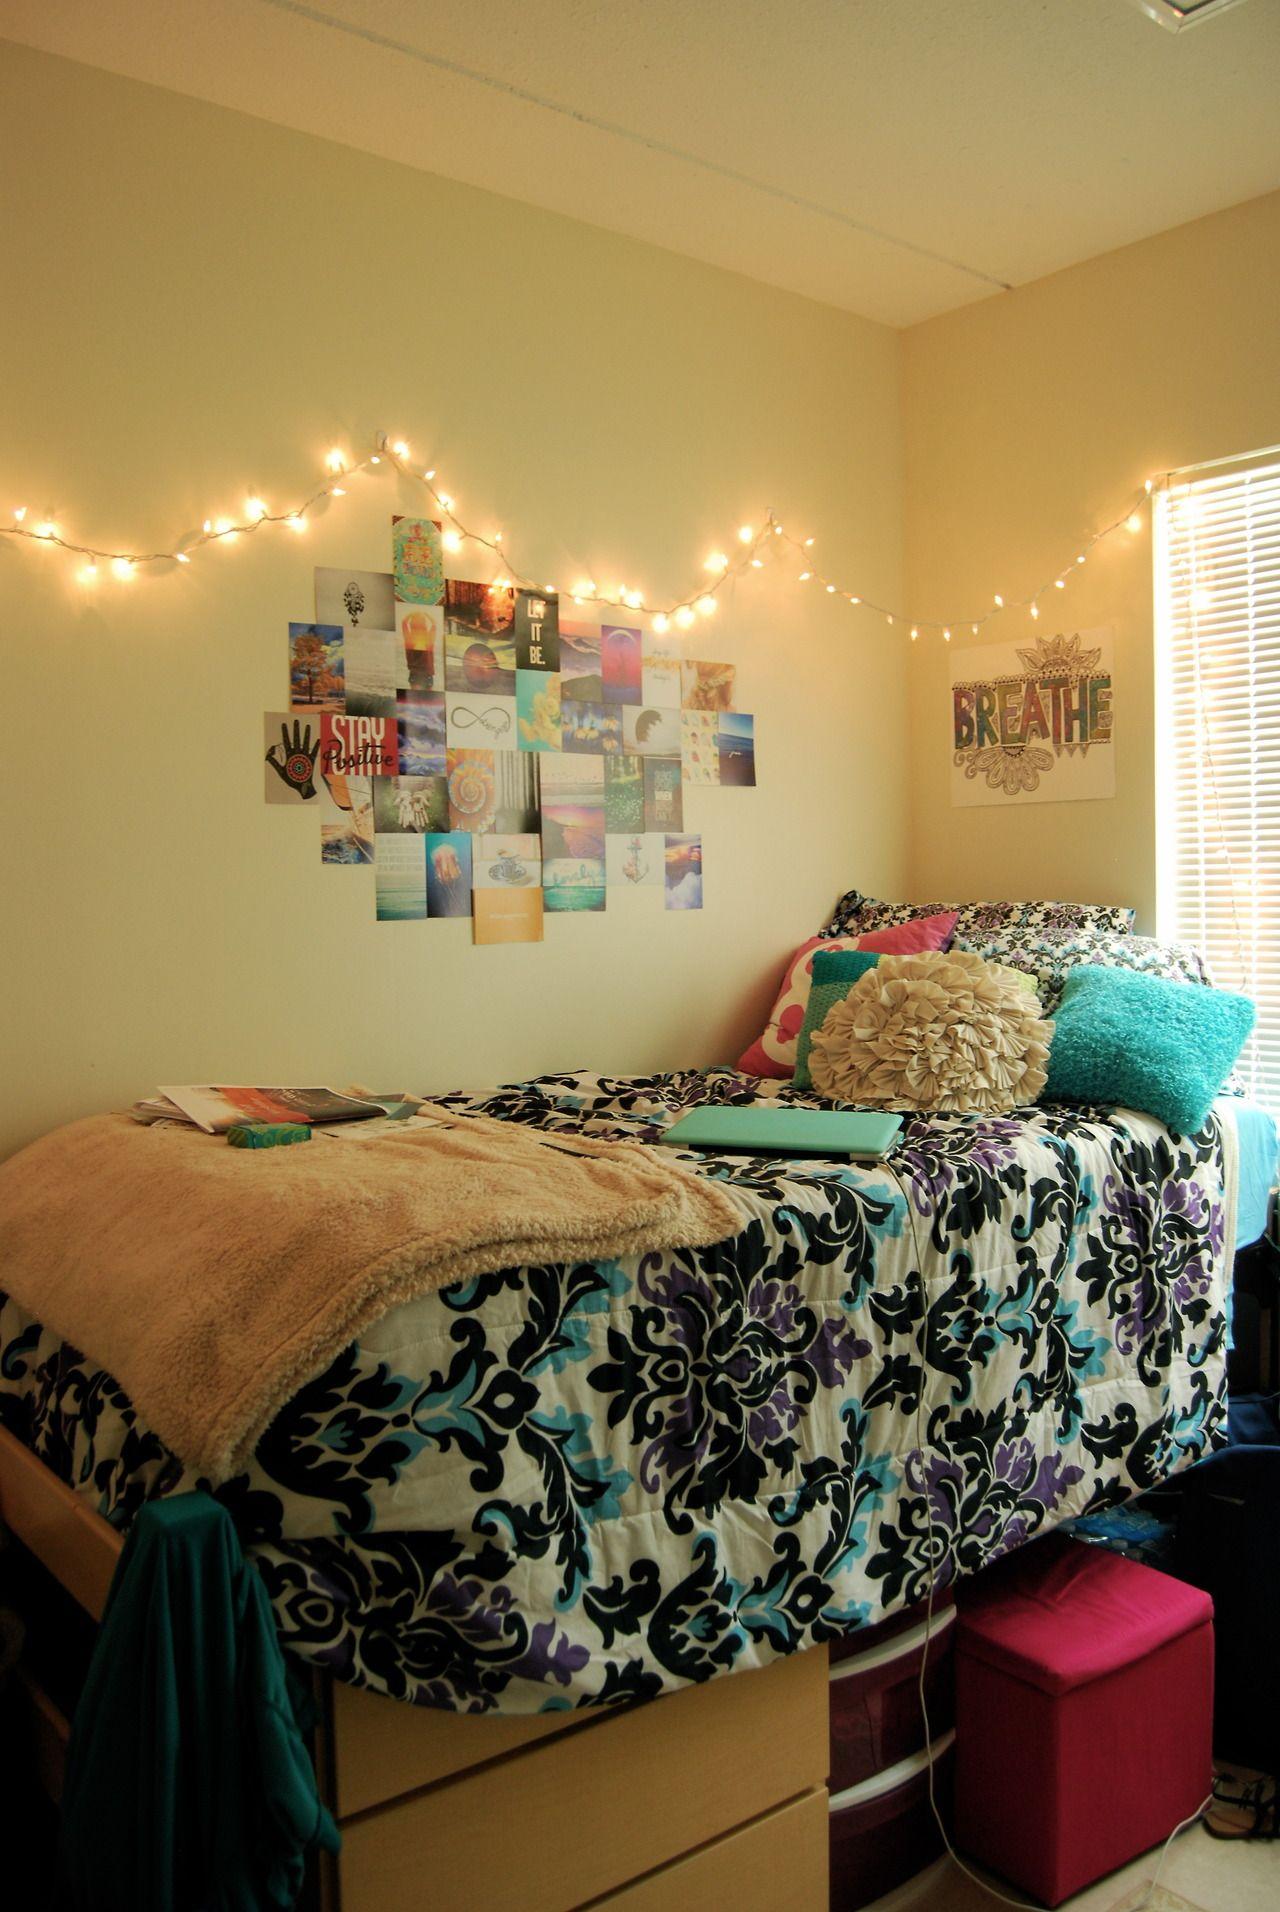 Dormroomdecor tumblr dorm room decor cool dorm